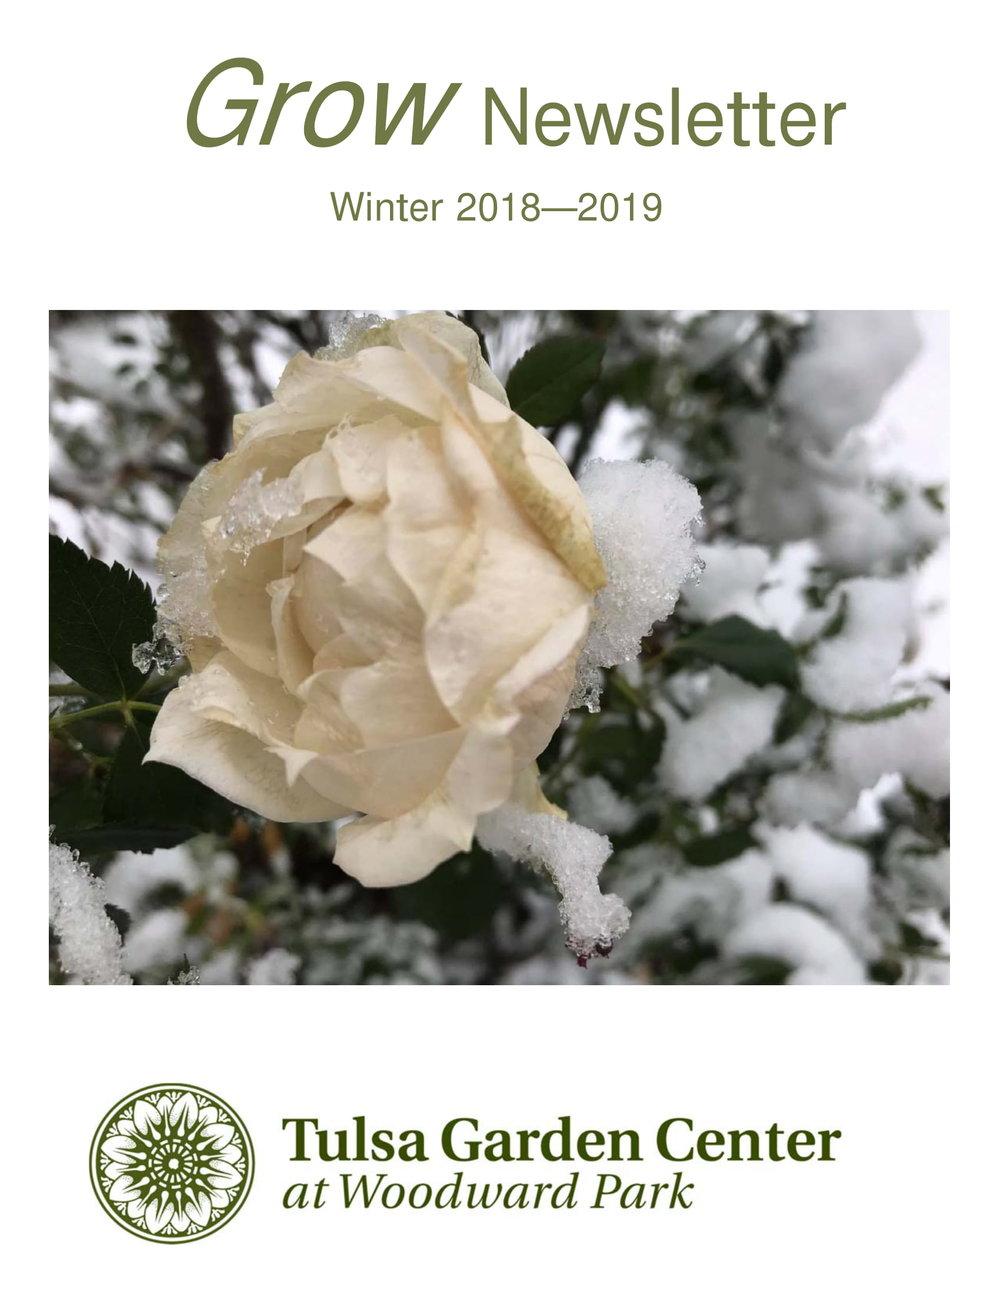 Winter 2018/2019